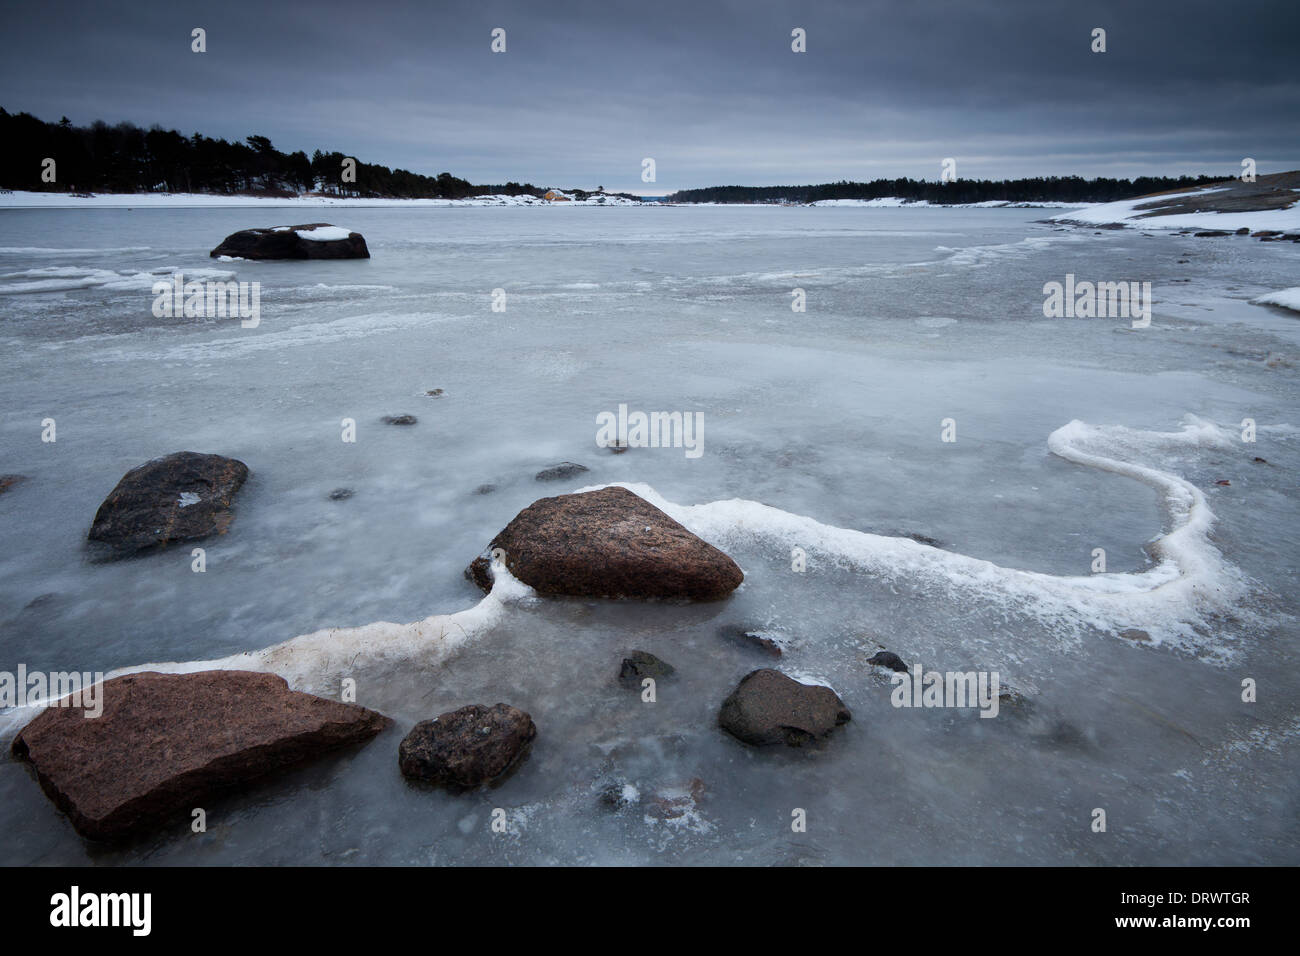 Küsten Winterlandschaft am Oslofjord, im Ofen in Råde Kommune, Østfold fylke, Norwegen. Stockbild